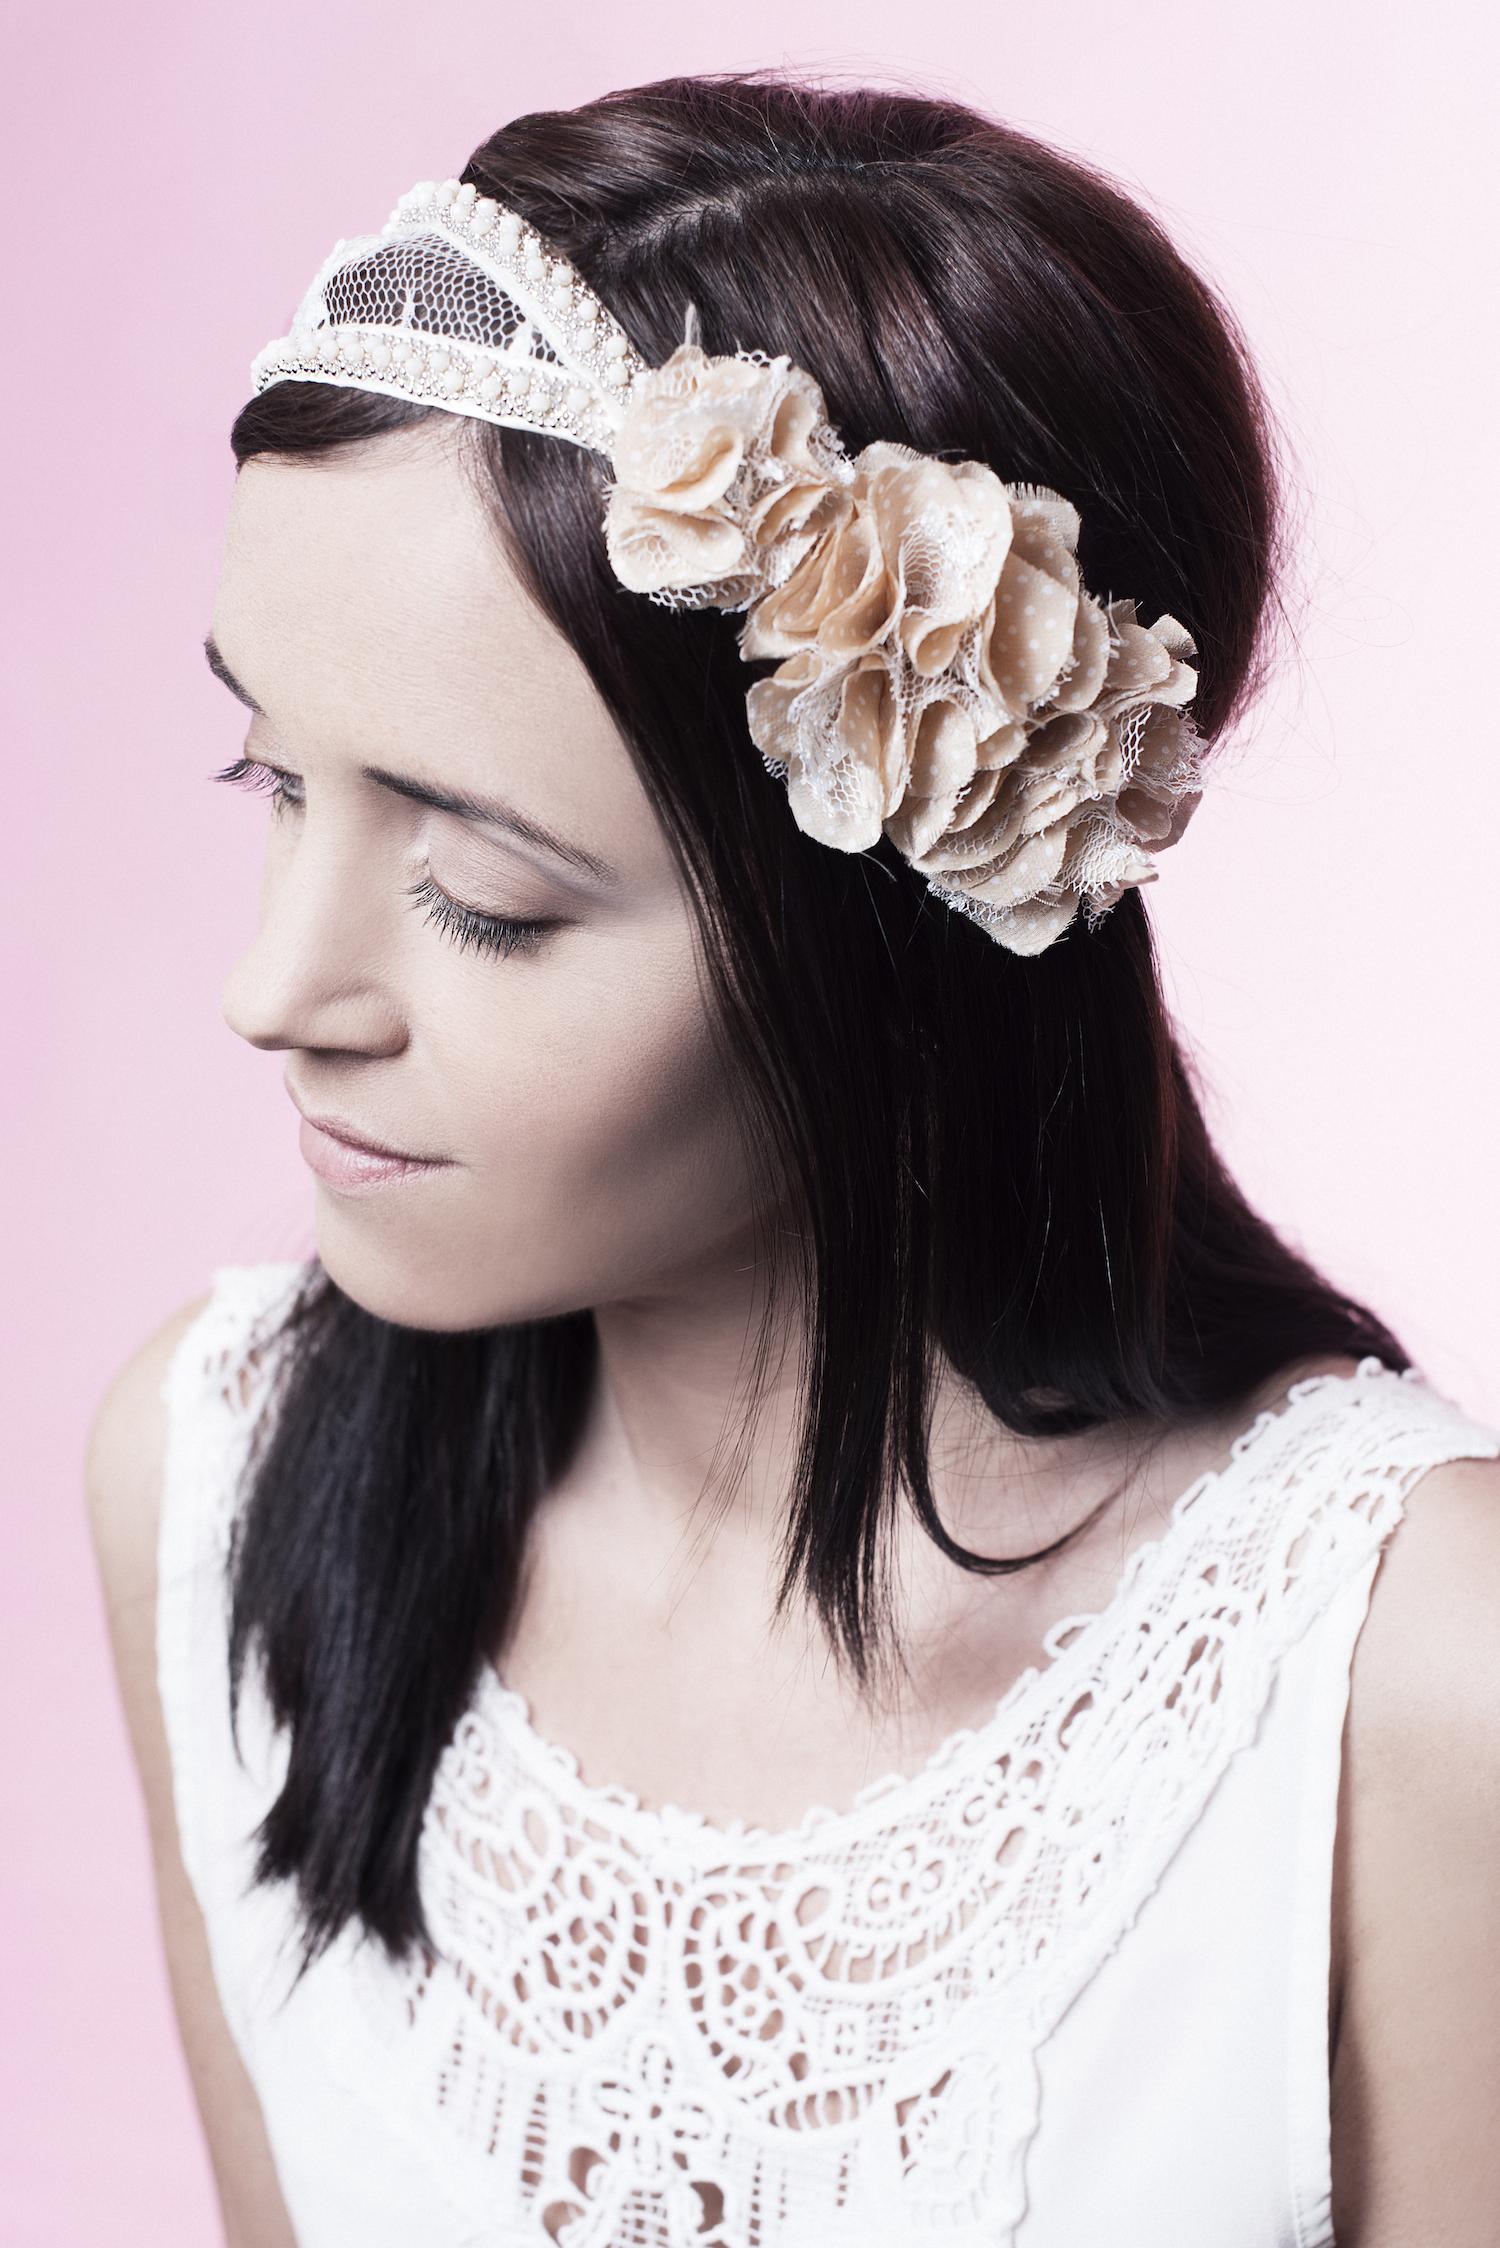 Justine Jugnet - Femme Portrait Test Agence Book Fleur Tand3m Headband Lyon Mode - Edito Magazine - Studio le carre